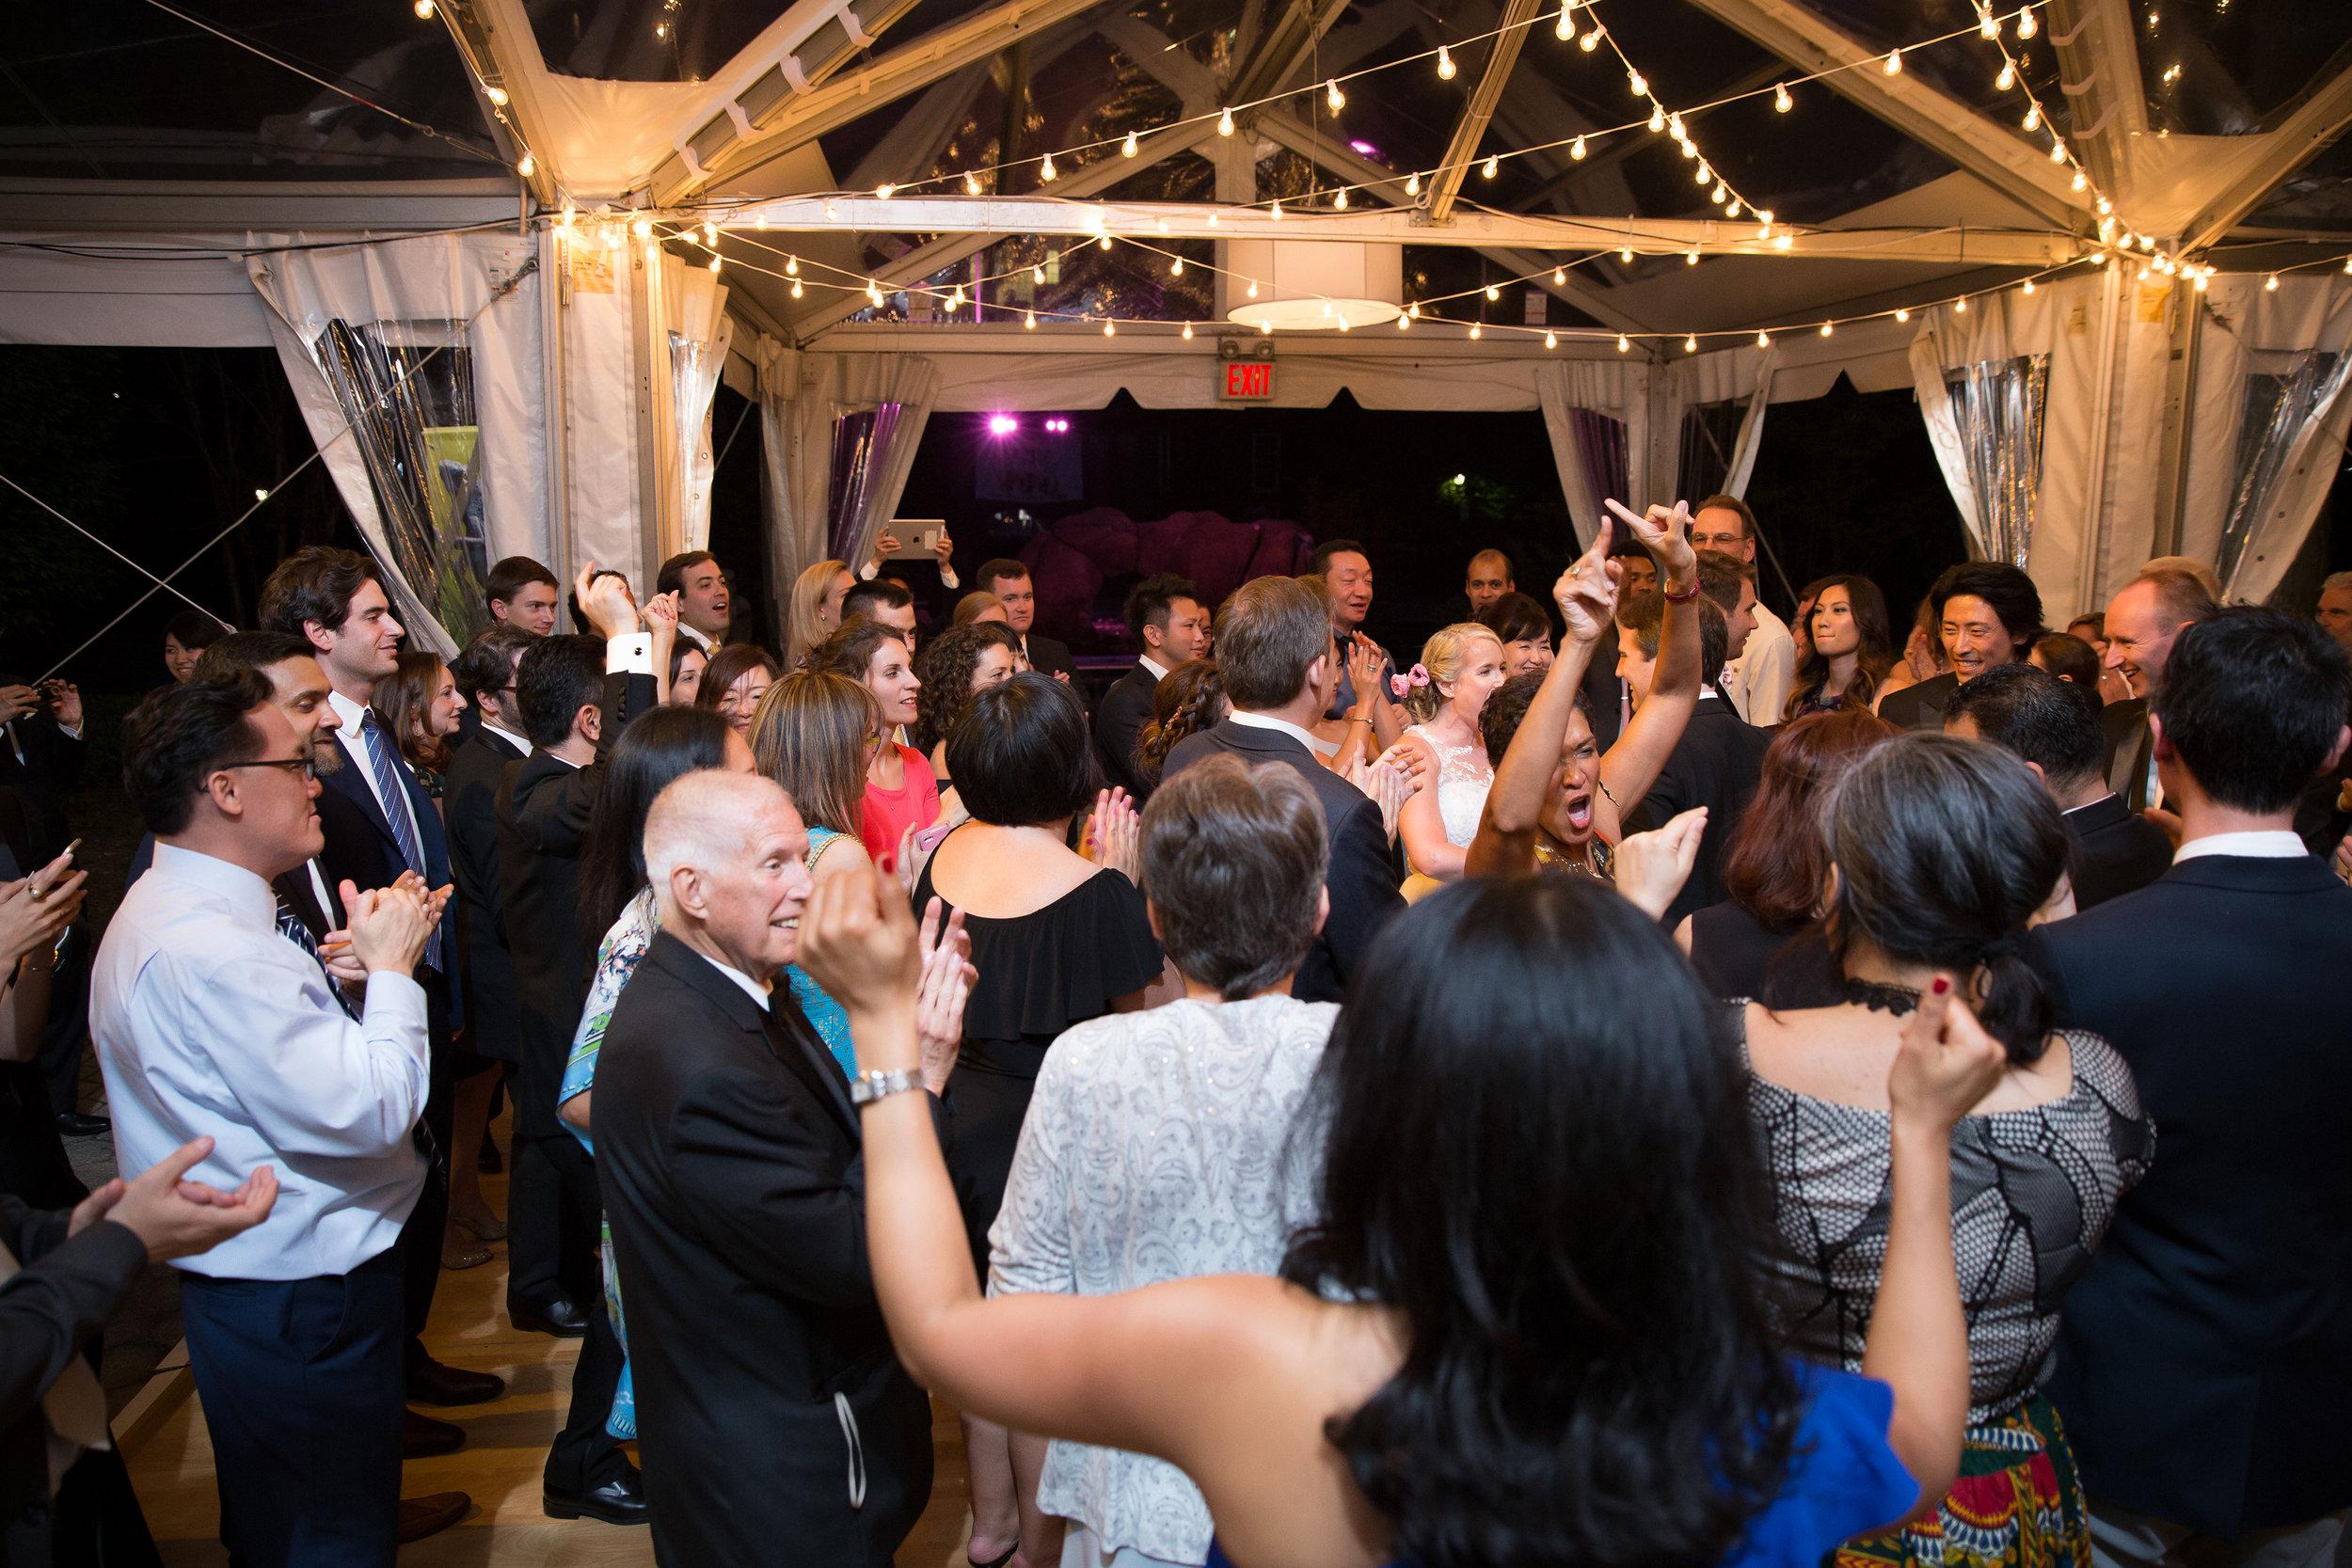 victorious-events-nyc-036-colleen-taka-central-park-zoo-wedding-raymond-hamlin.jpg